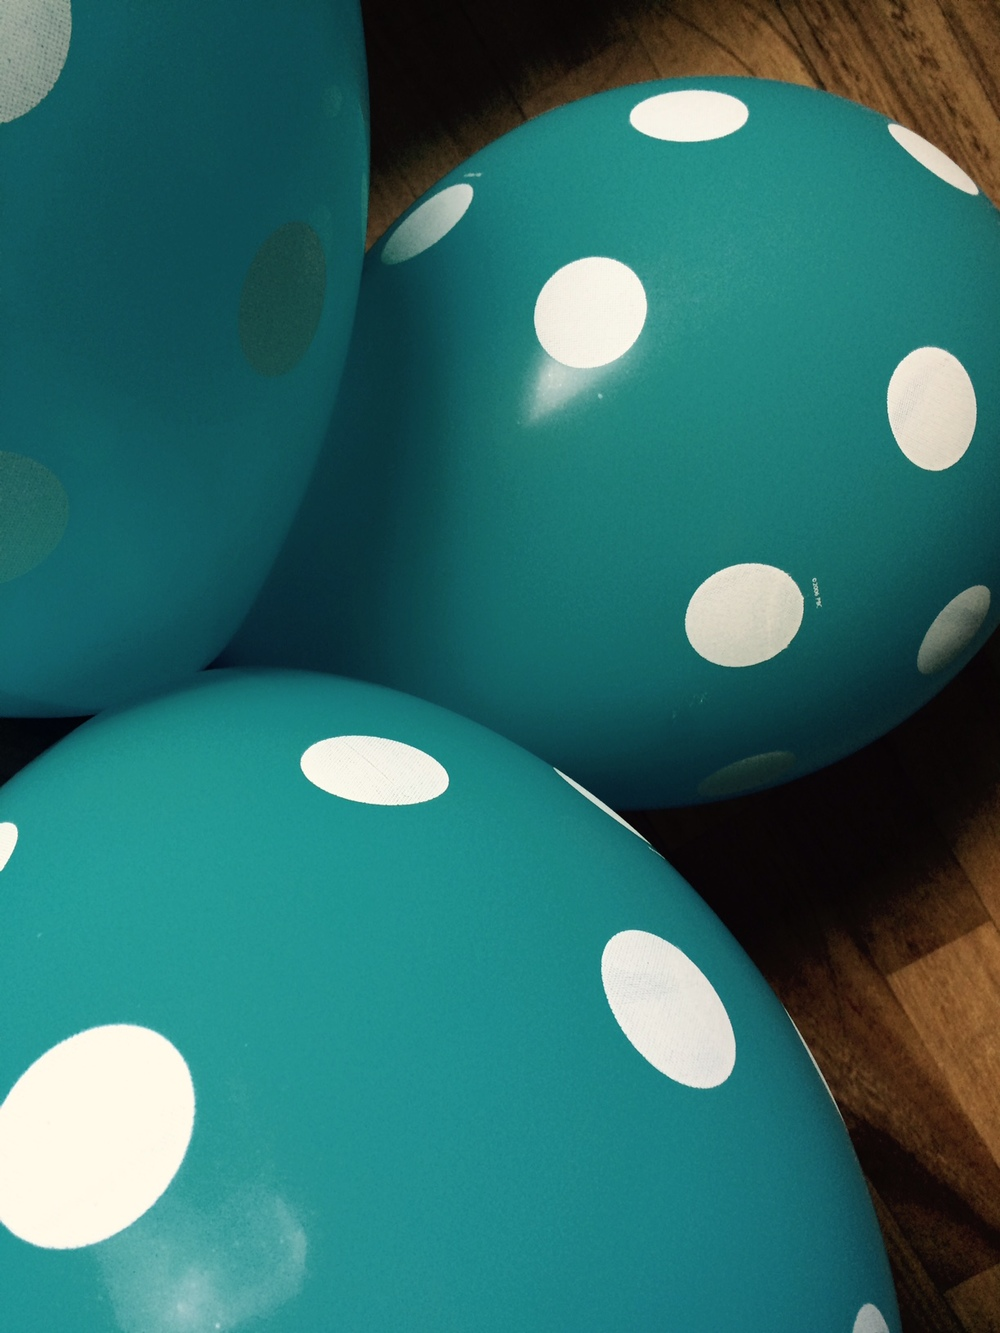 YFINN ballon.jpg